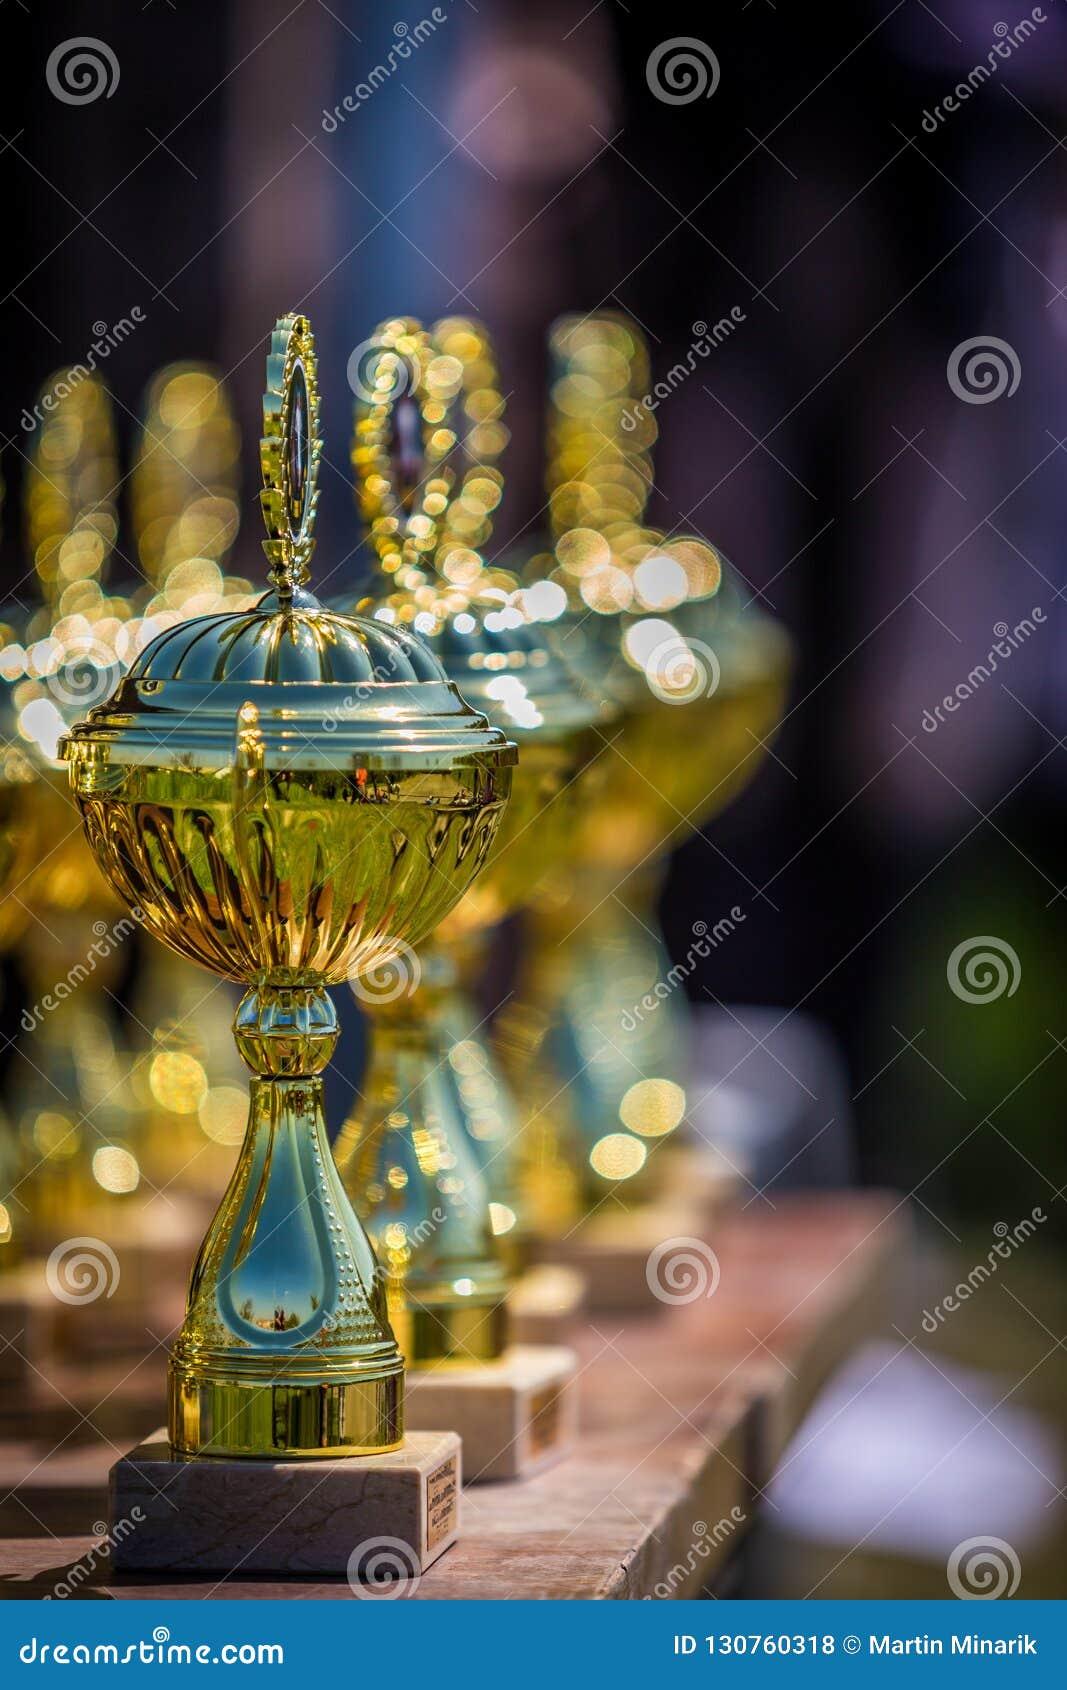 Сияющая компановка трофеев на таблице